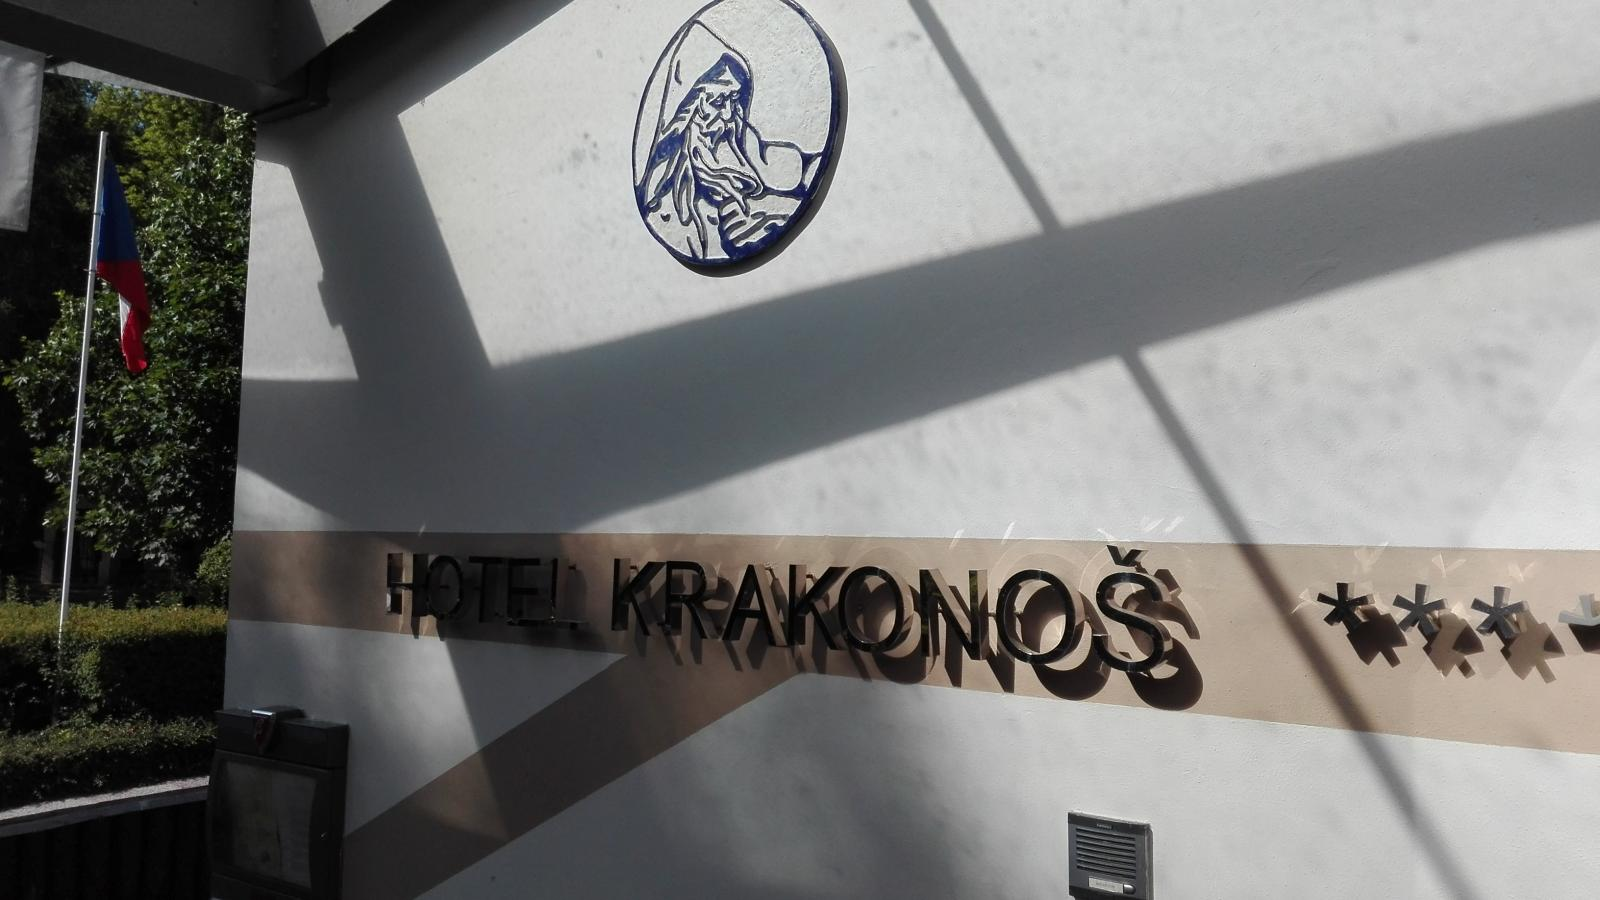 oprava_voip_krakonos-2016_2_blog_header